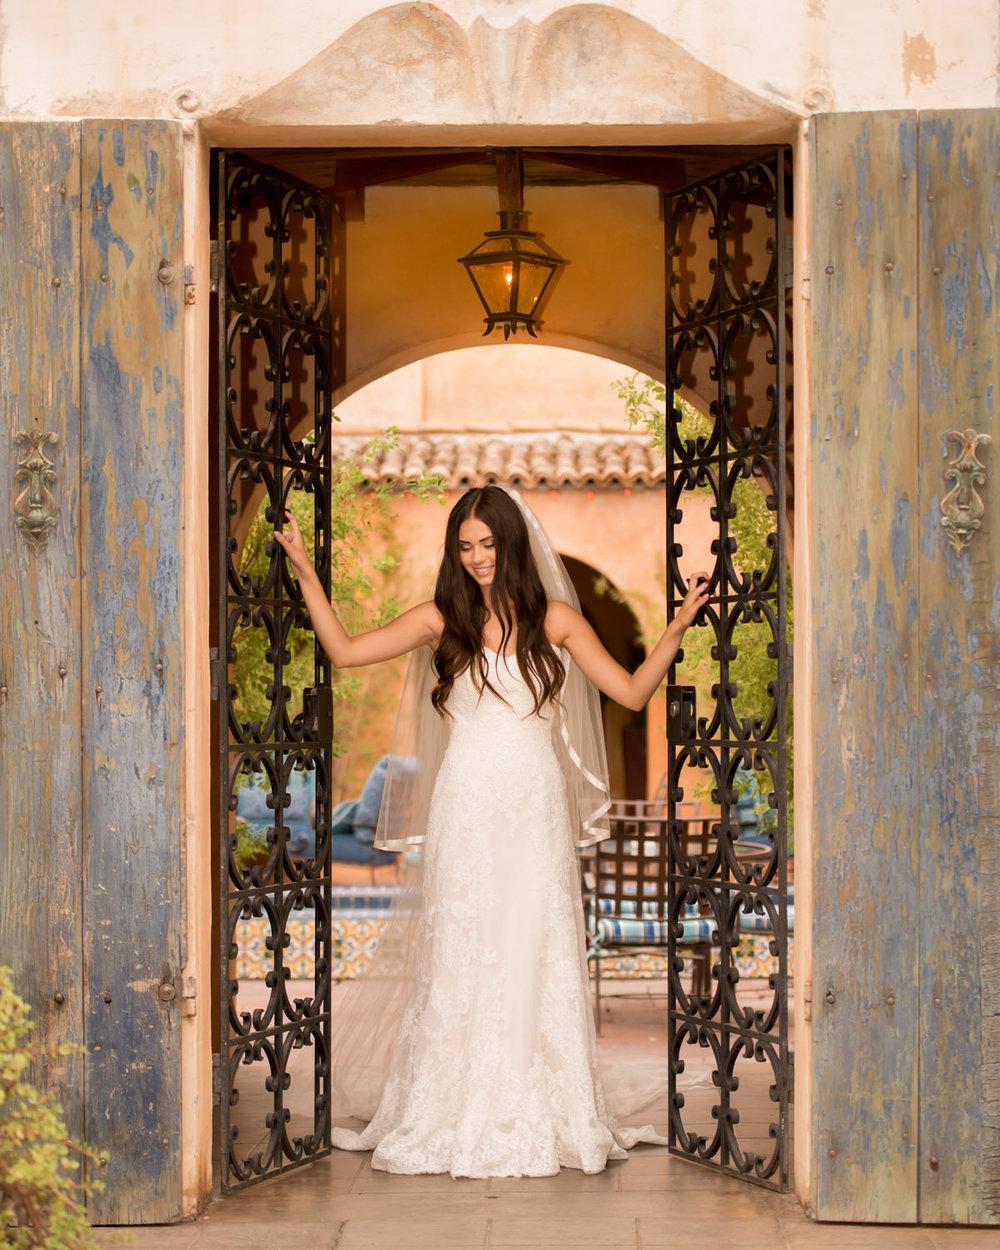 Wedding Woodinville Bride Gown Nordstrom-1.jpg